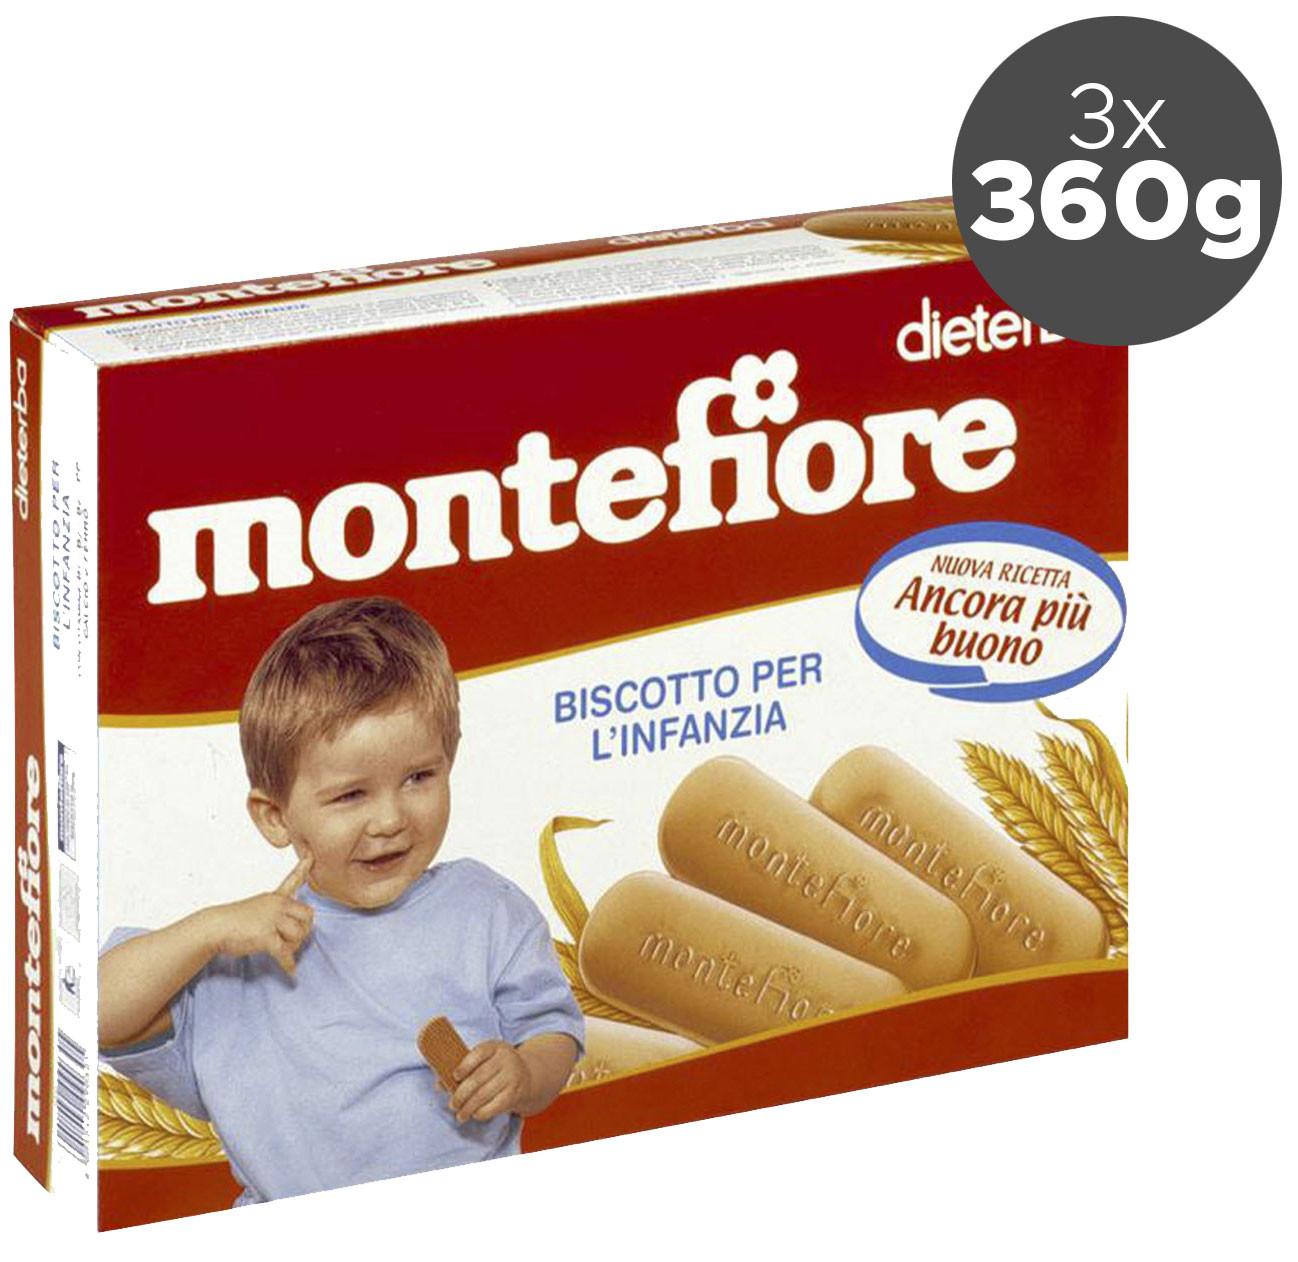 Biscotti Montefiore - 3 x 360 g